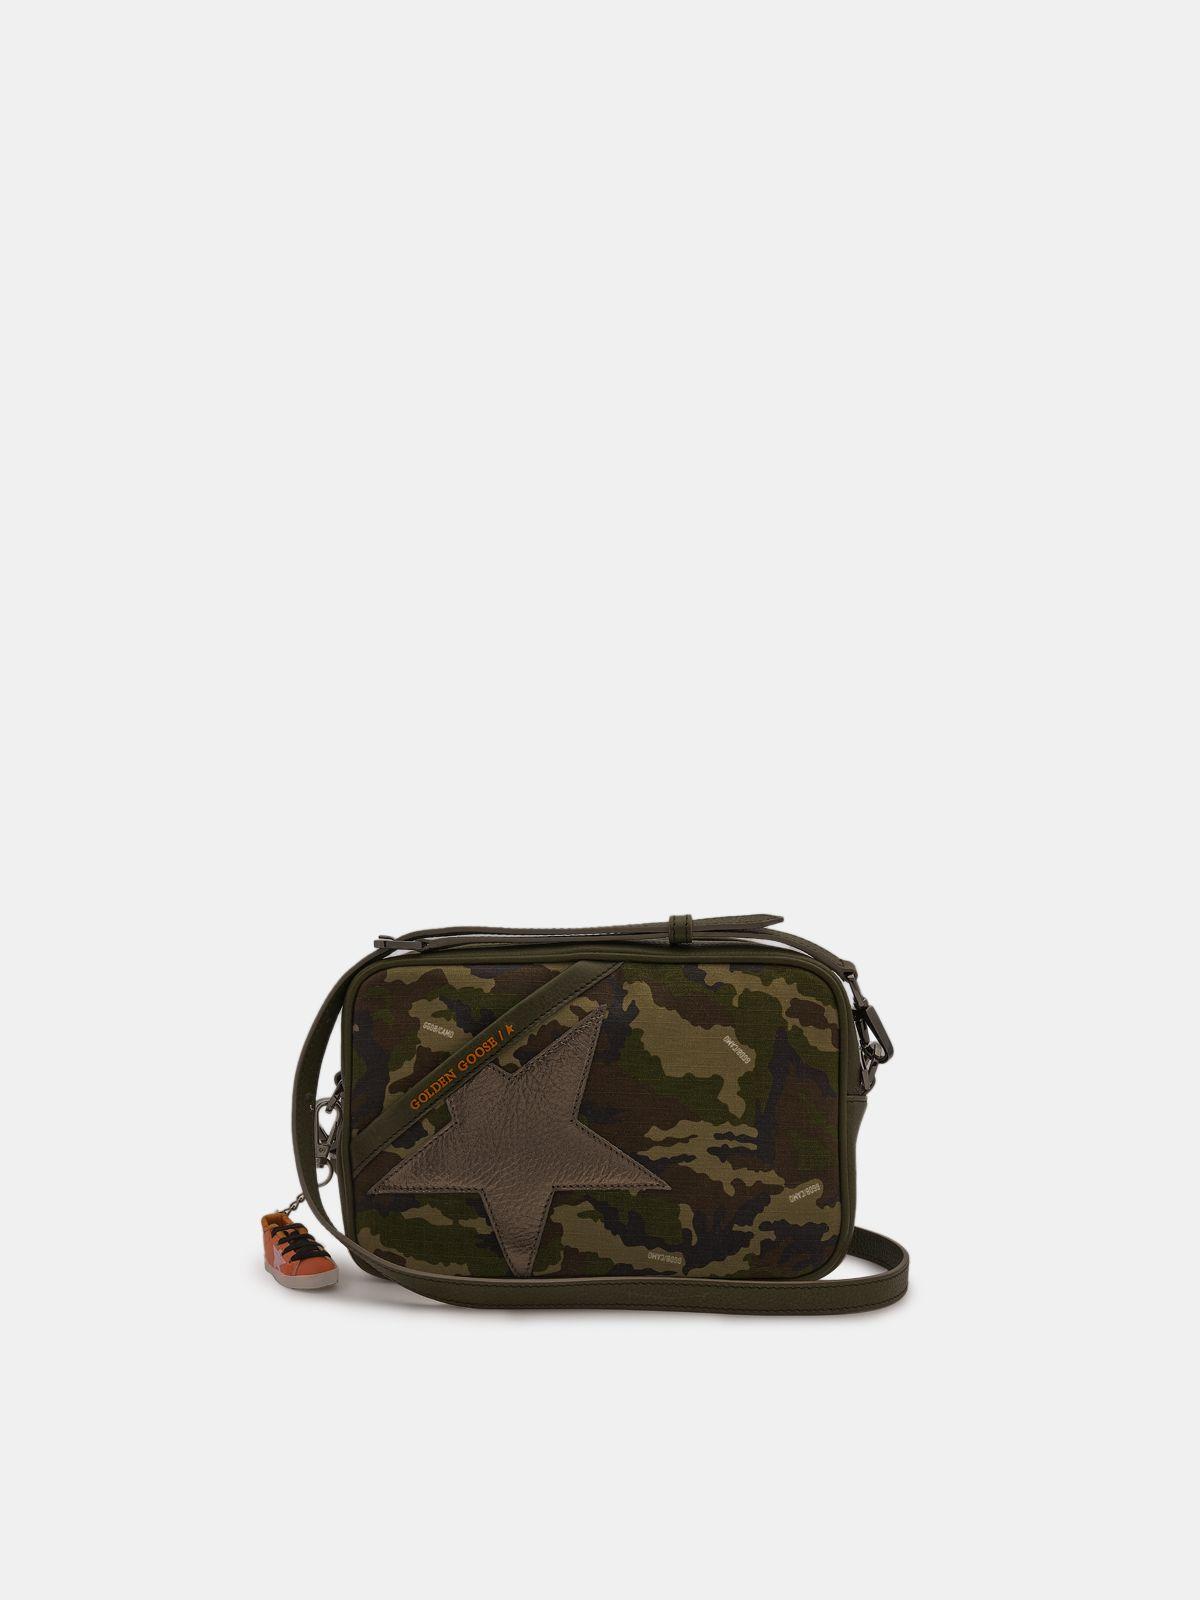 Golden Goose - Borsa Star Bag in tela camouflage con stella laminata in